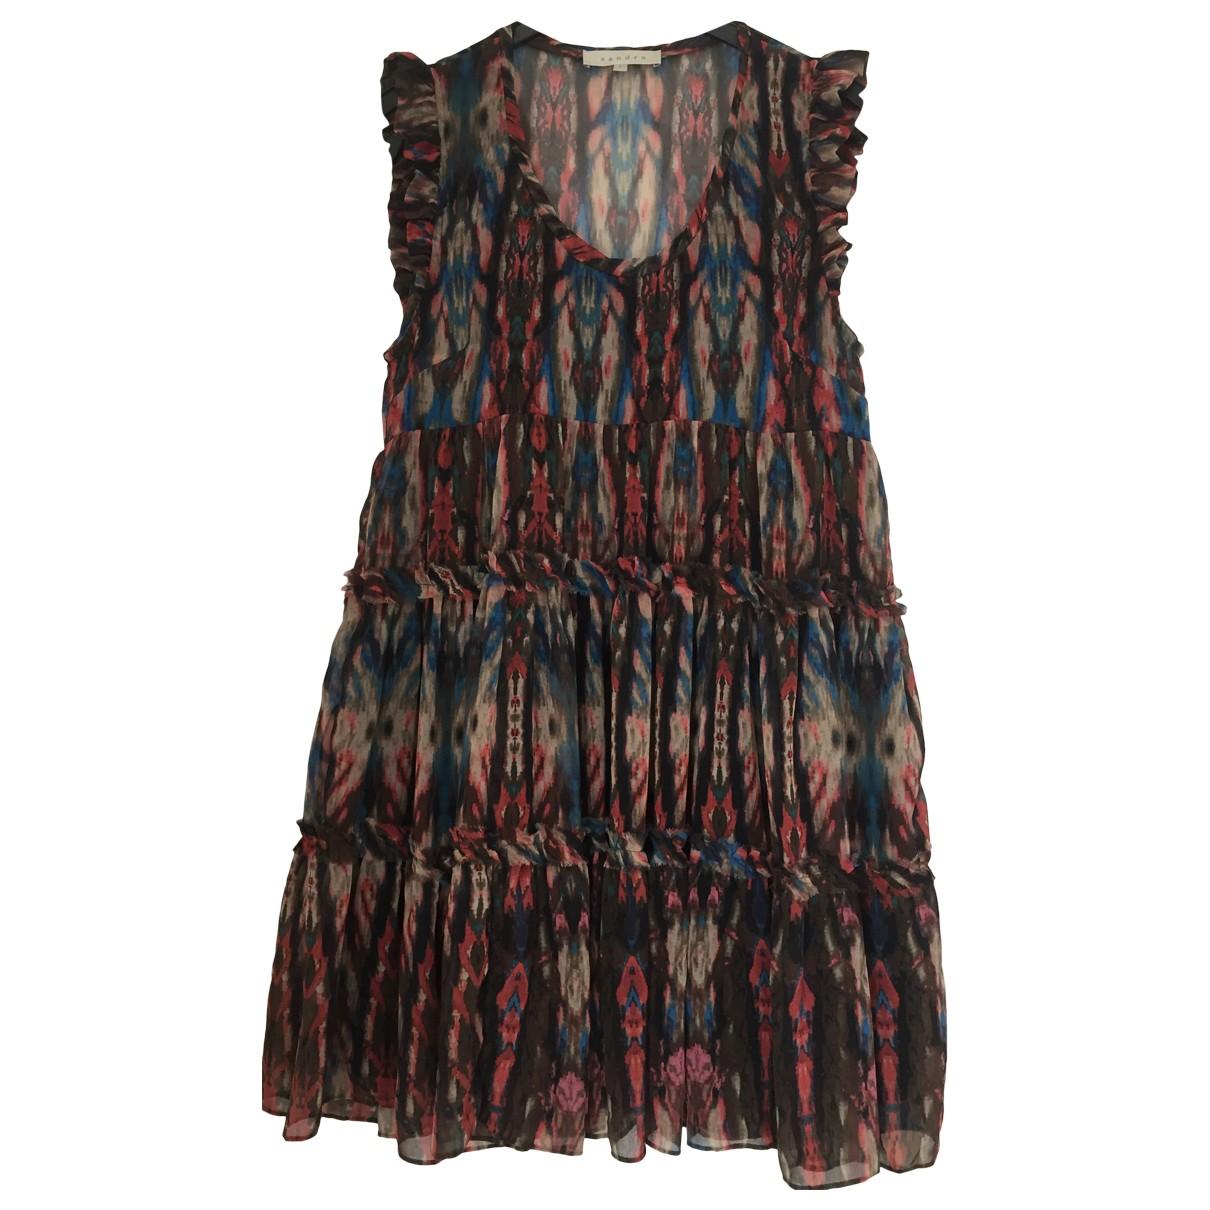 Sandro \N Kleid in  Bunt Polyester